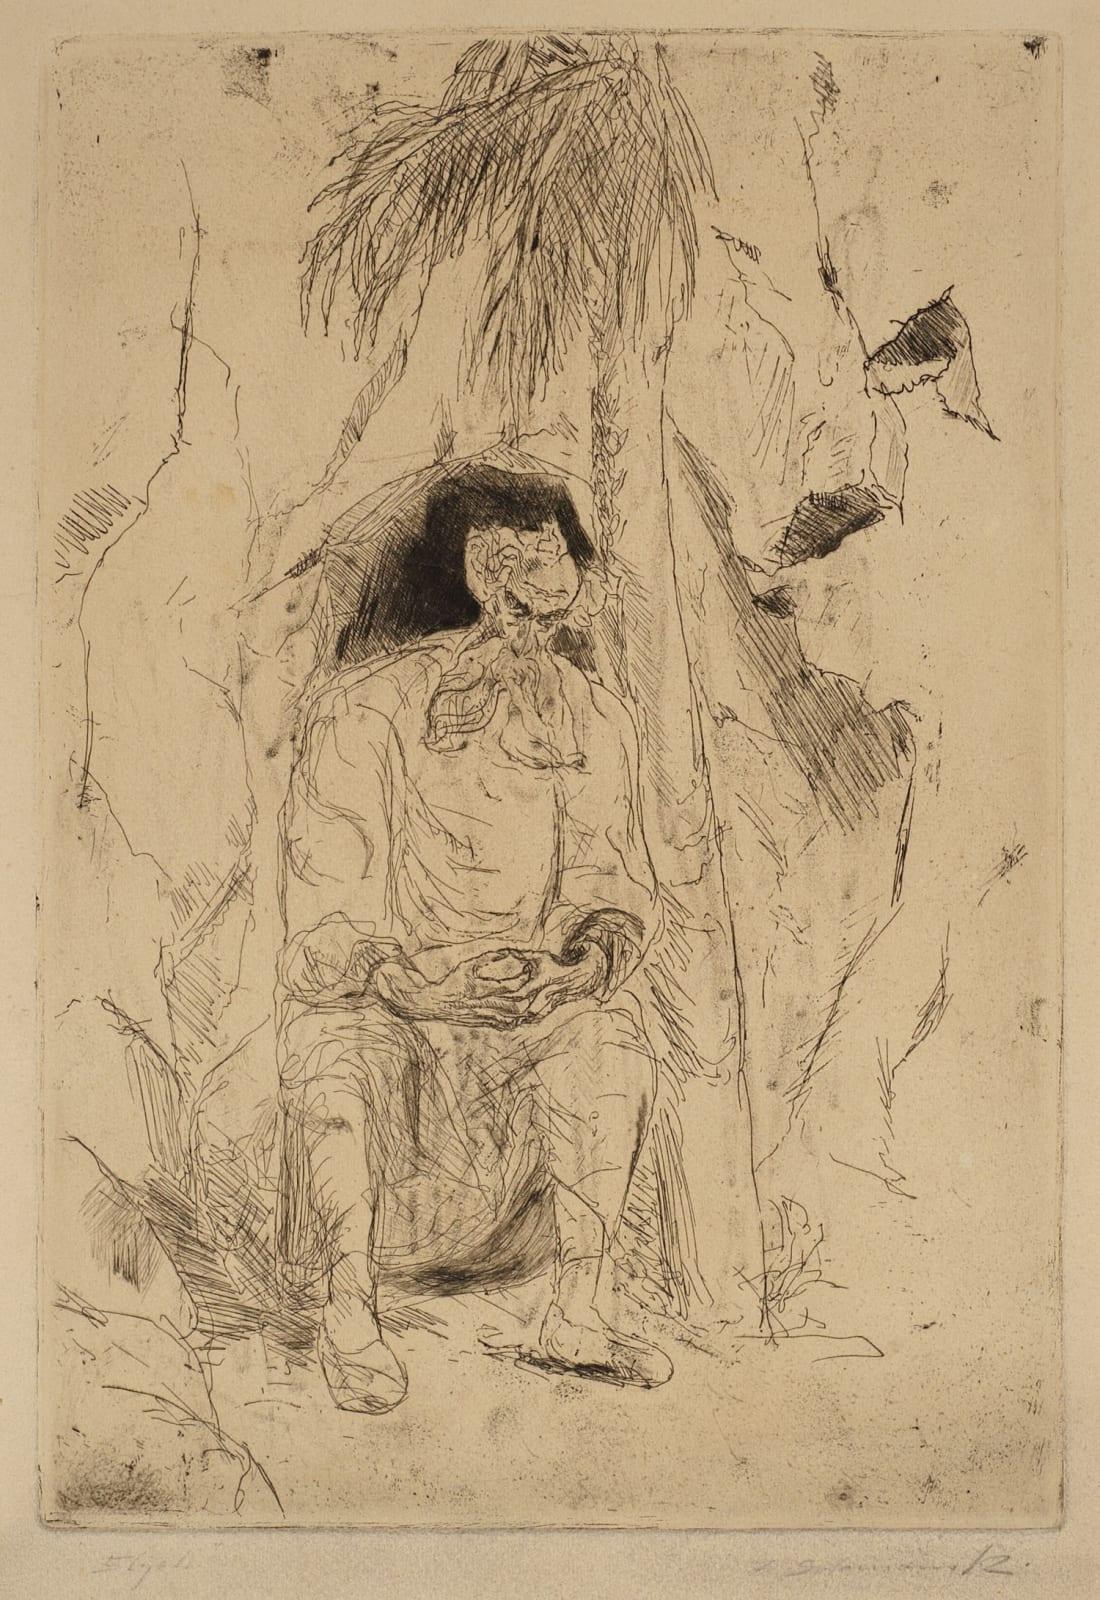 Frederick Solomonski (1899-1980) Elijah 1940 Etching on paper 38.5 x 26.5 cm Ben Uri Collection © Frederick Solomonski